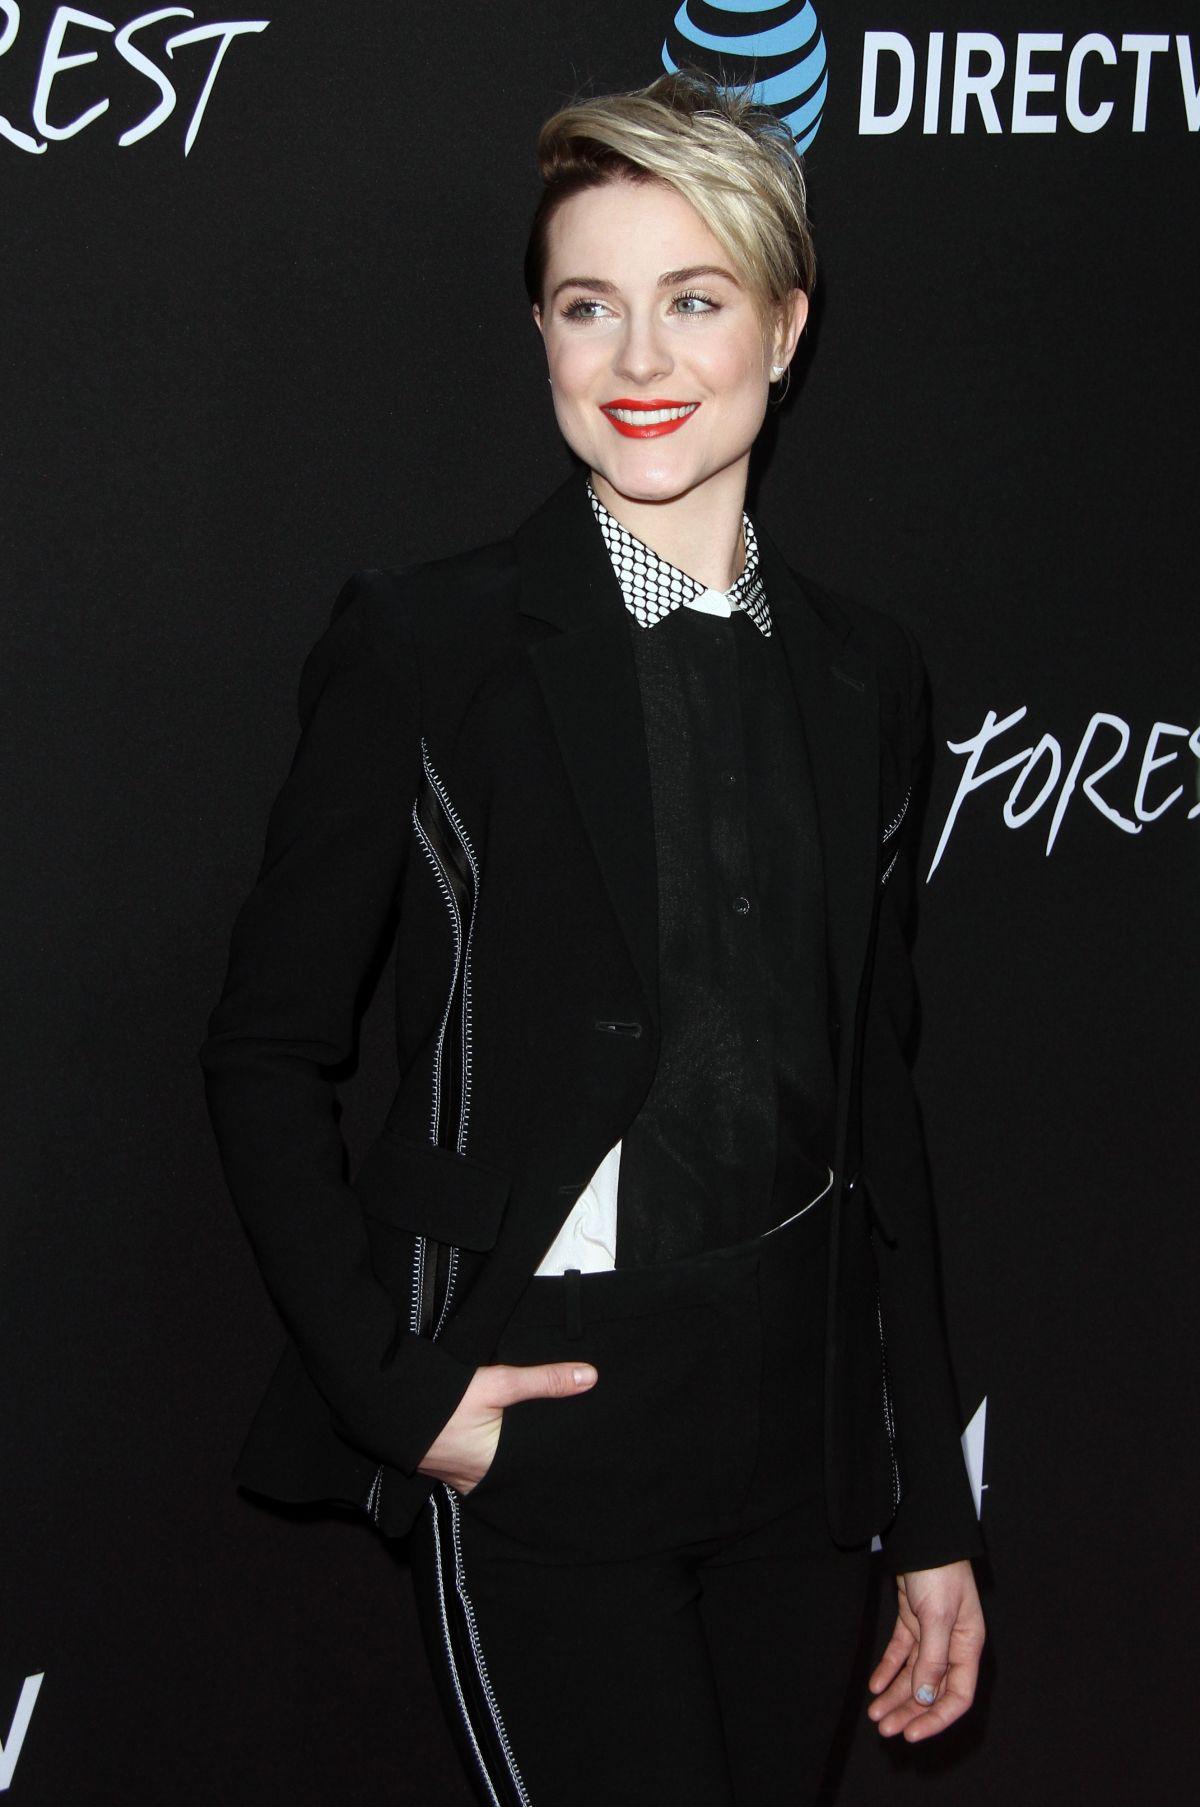 EVAN RACHEL WOOD at 'Into the Forest' Premire in Hollywood ... Evan Rachel Wood